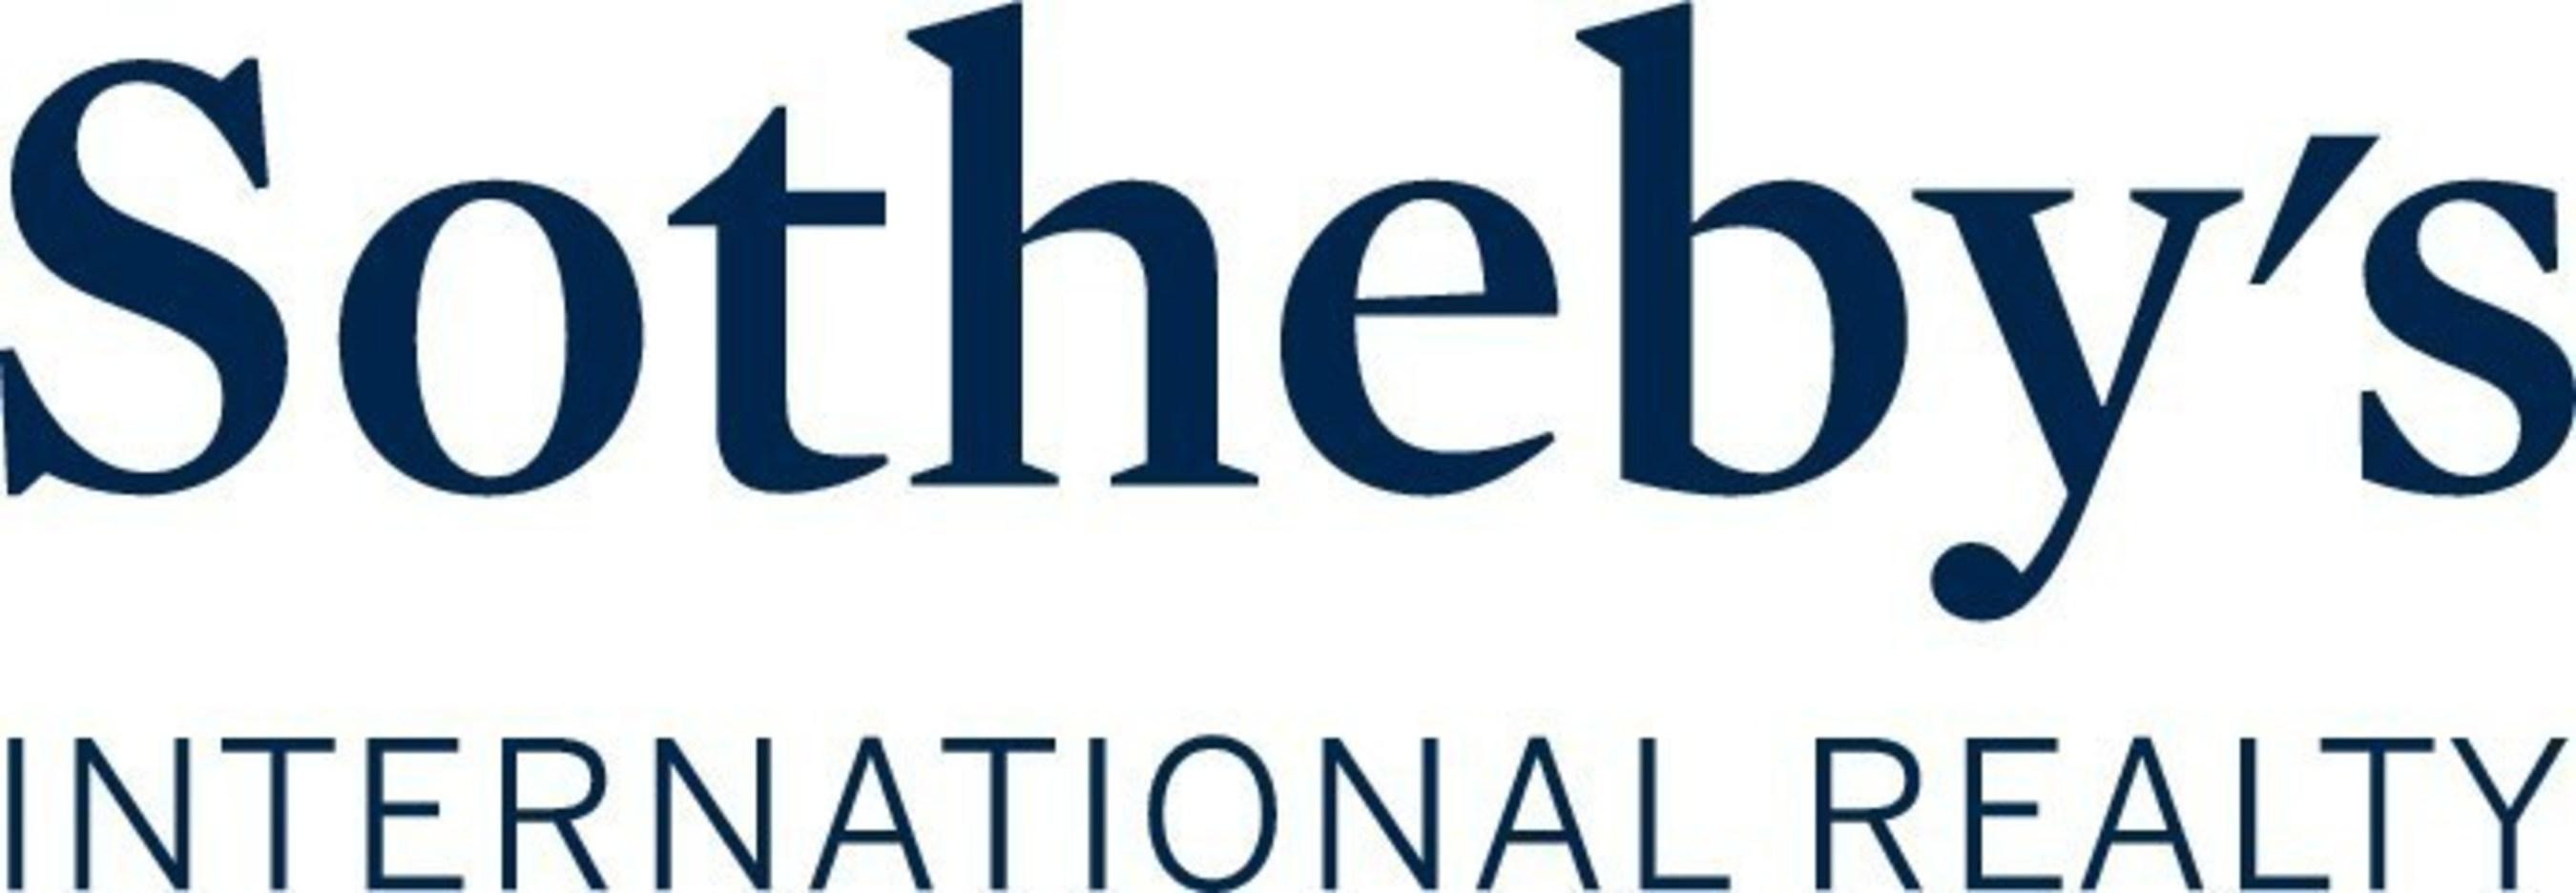 Sotheby's International Realty, Inc. logo